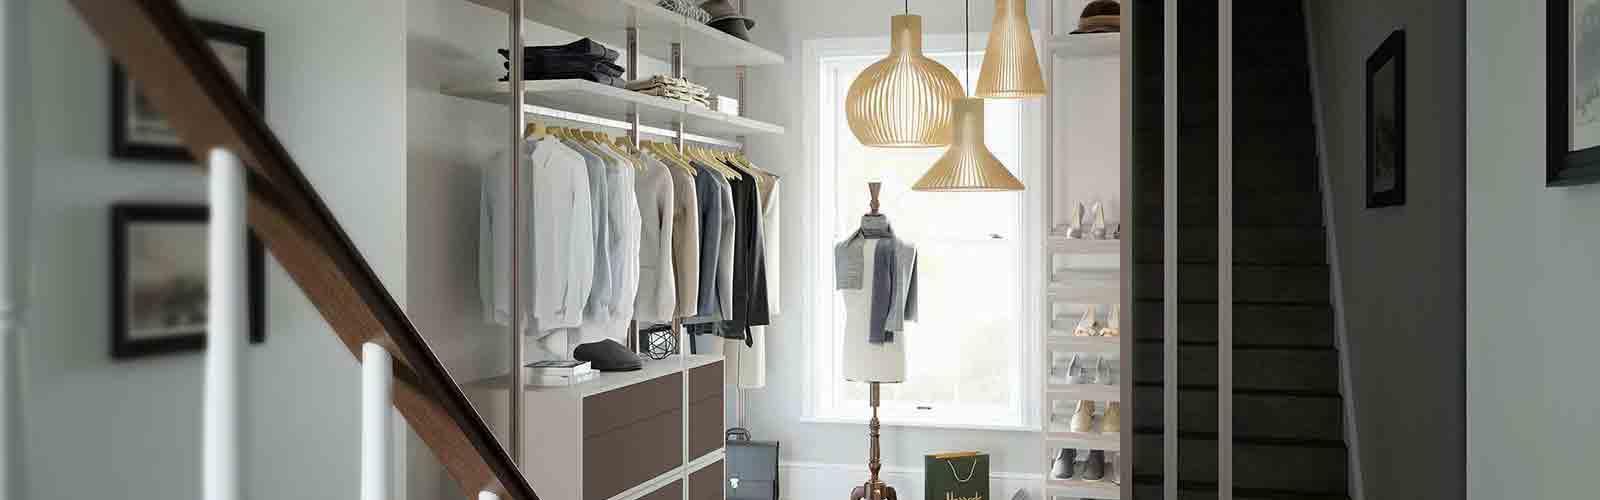 Home Decor Creative Living